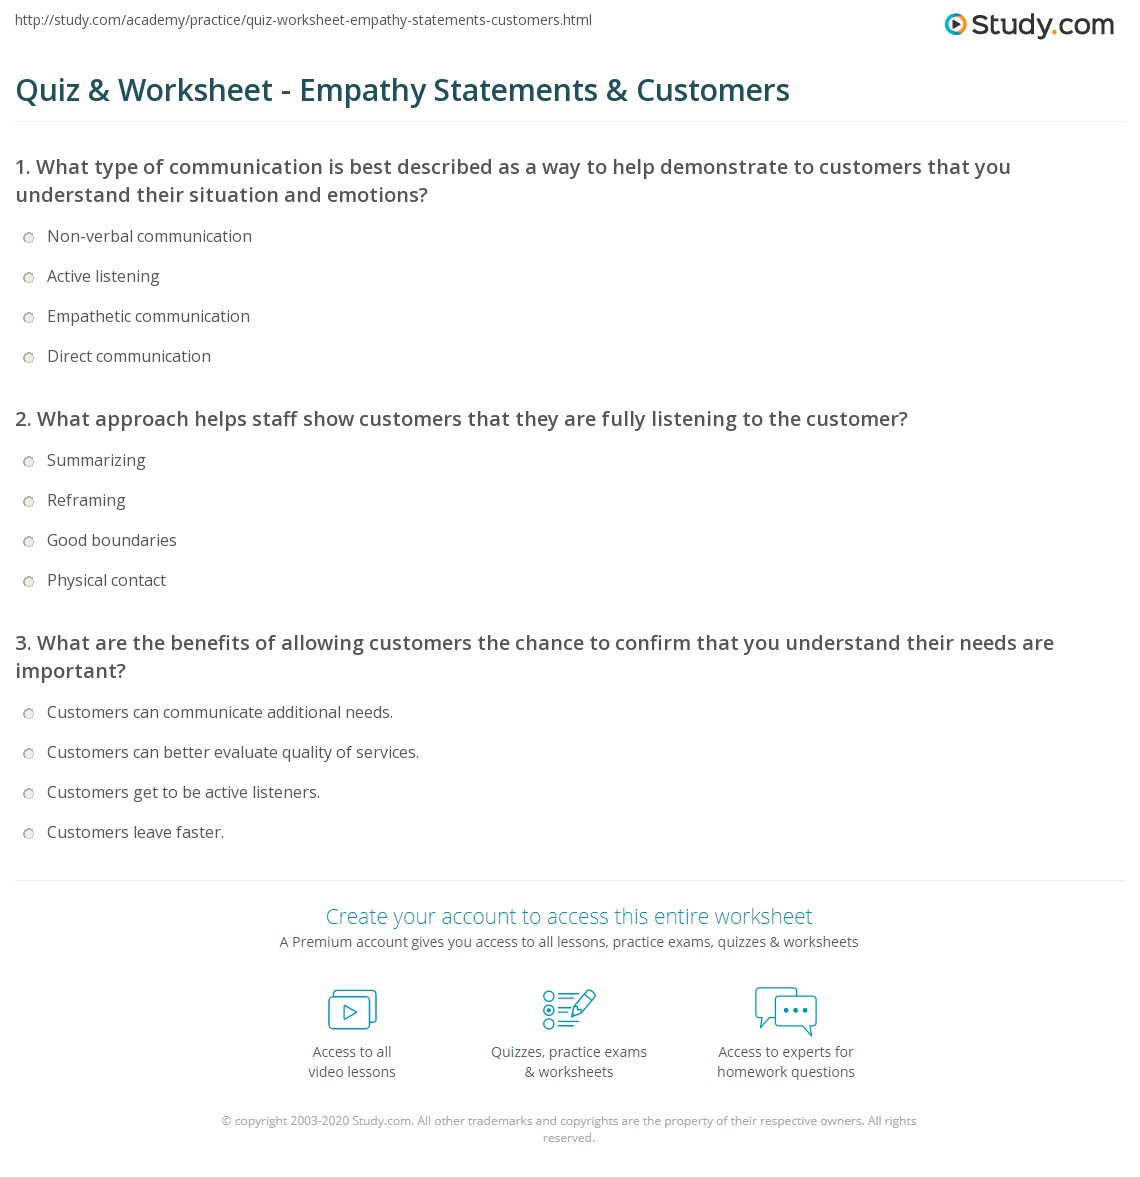 Quiz & Worksheet - Empathy Statements & Customers | Study.com